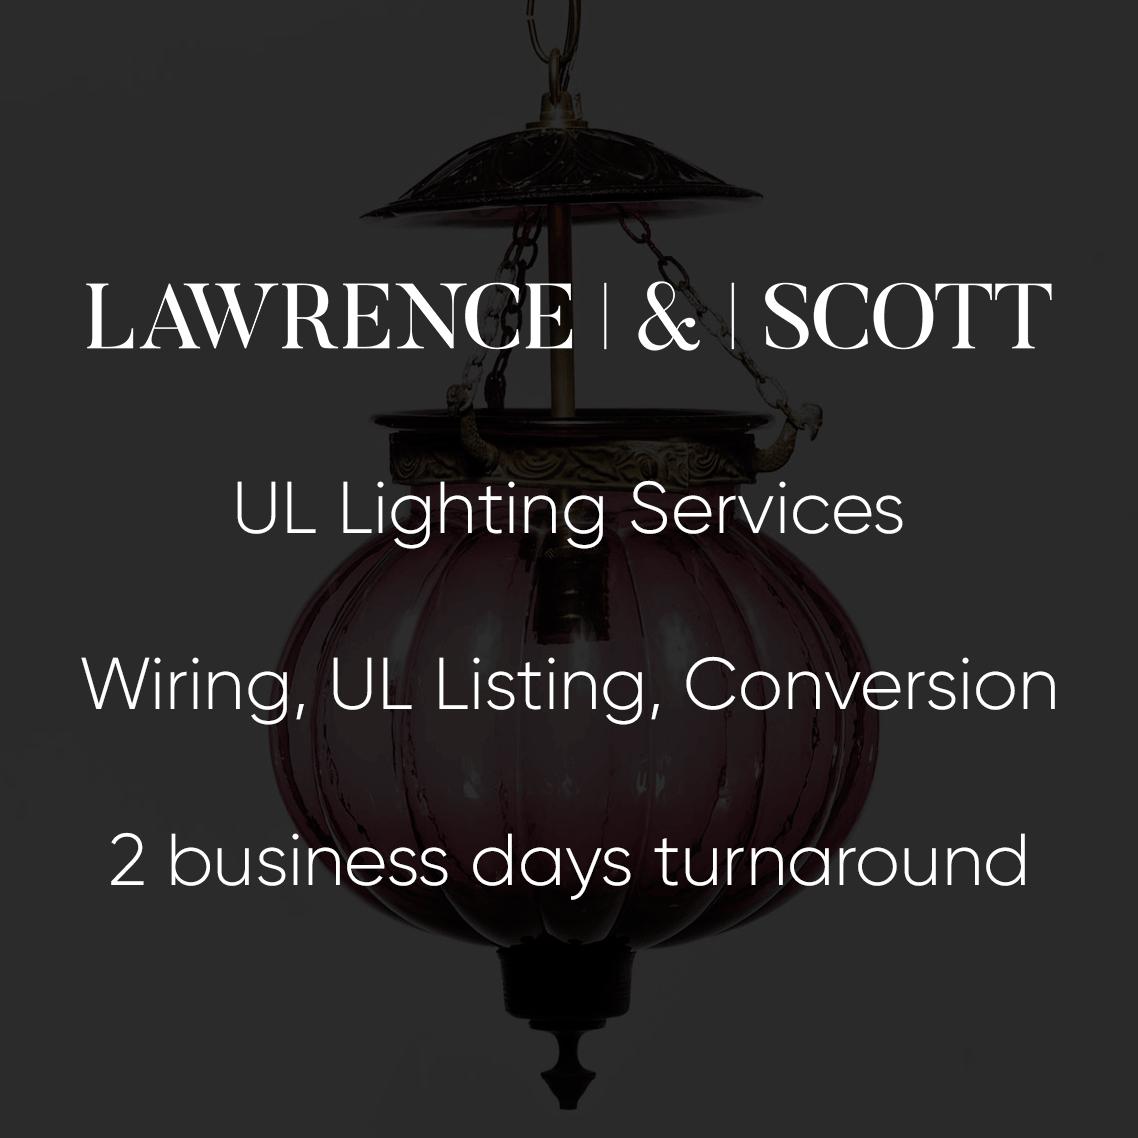 Lawrence & Scott UL Services